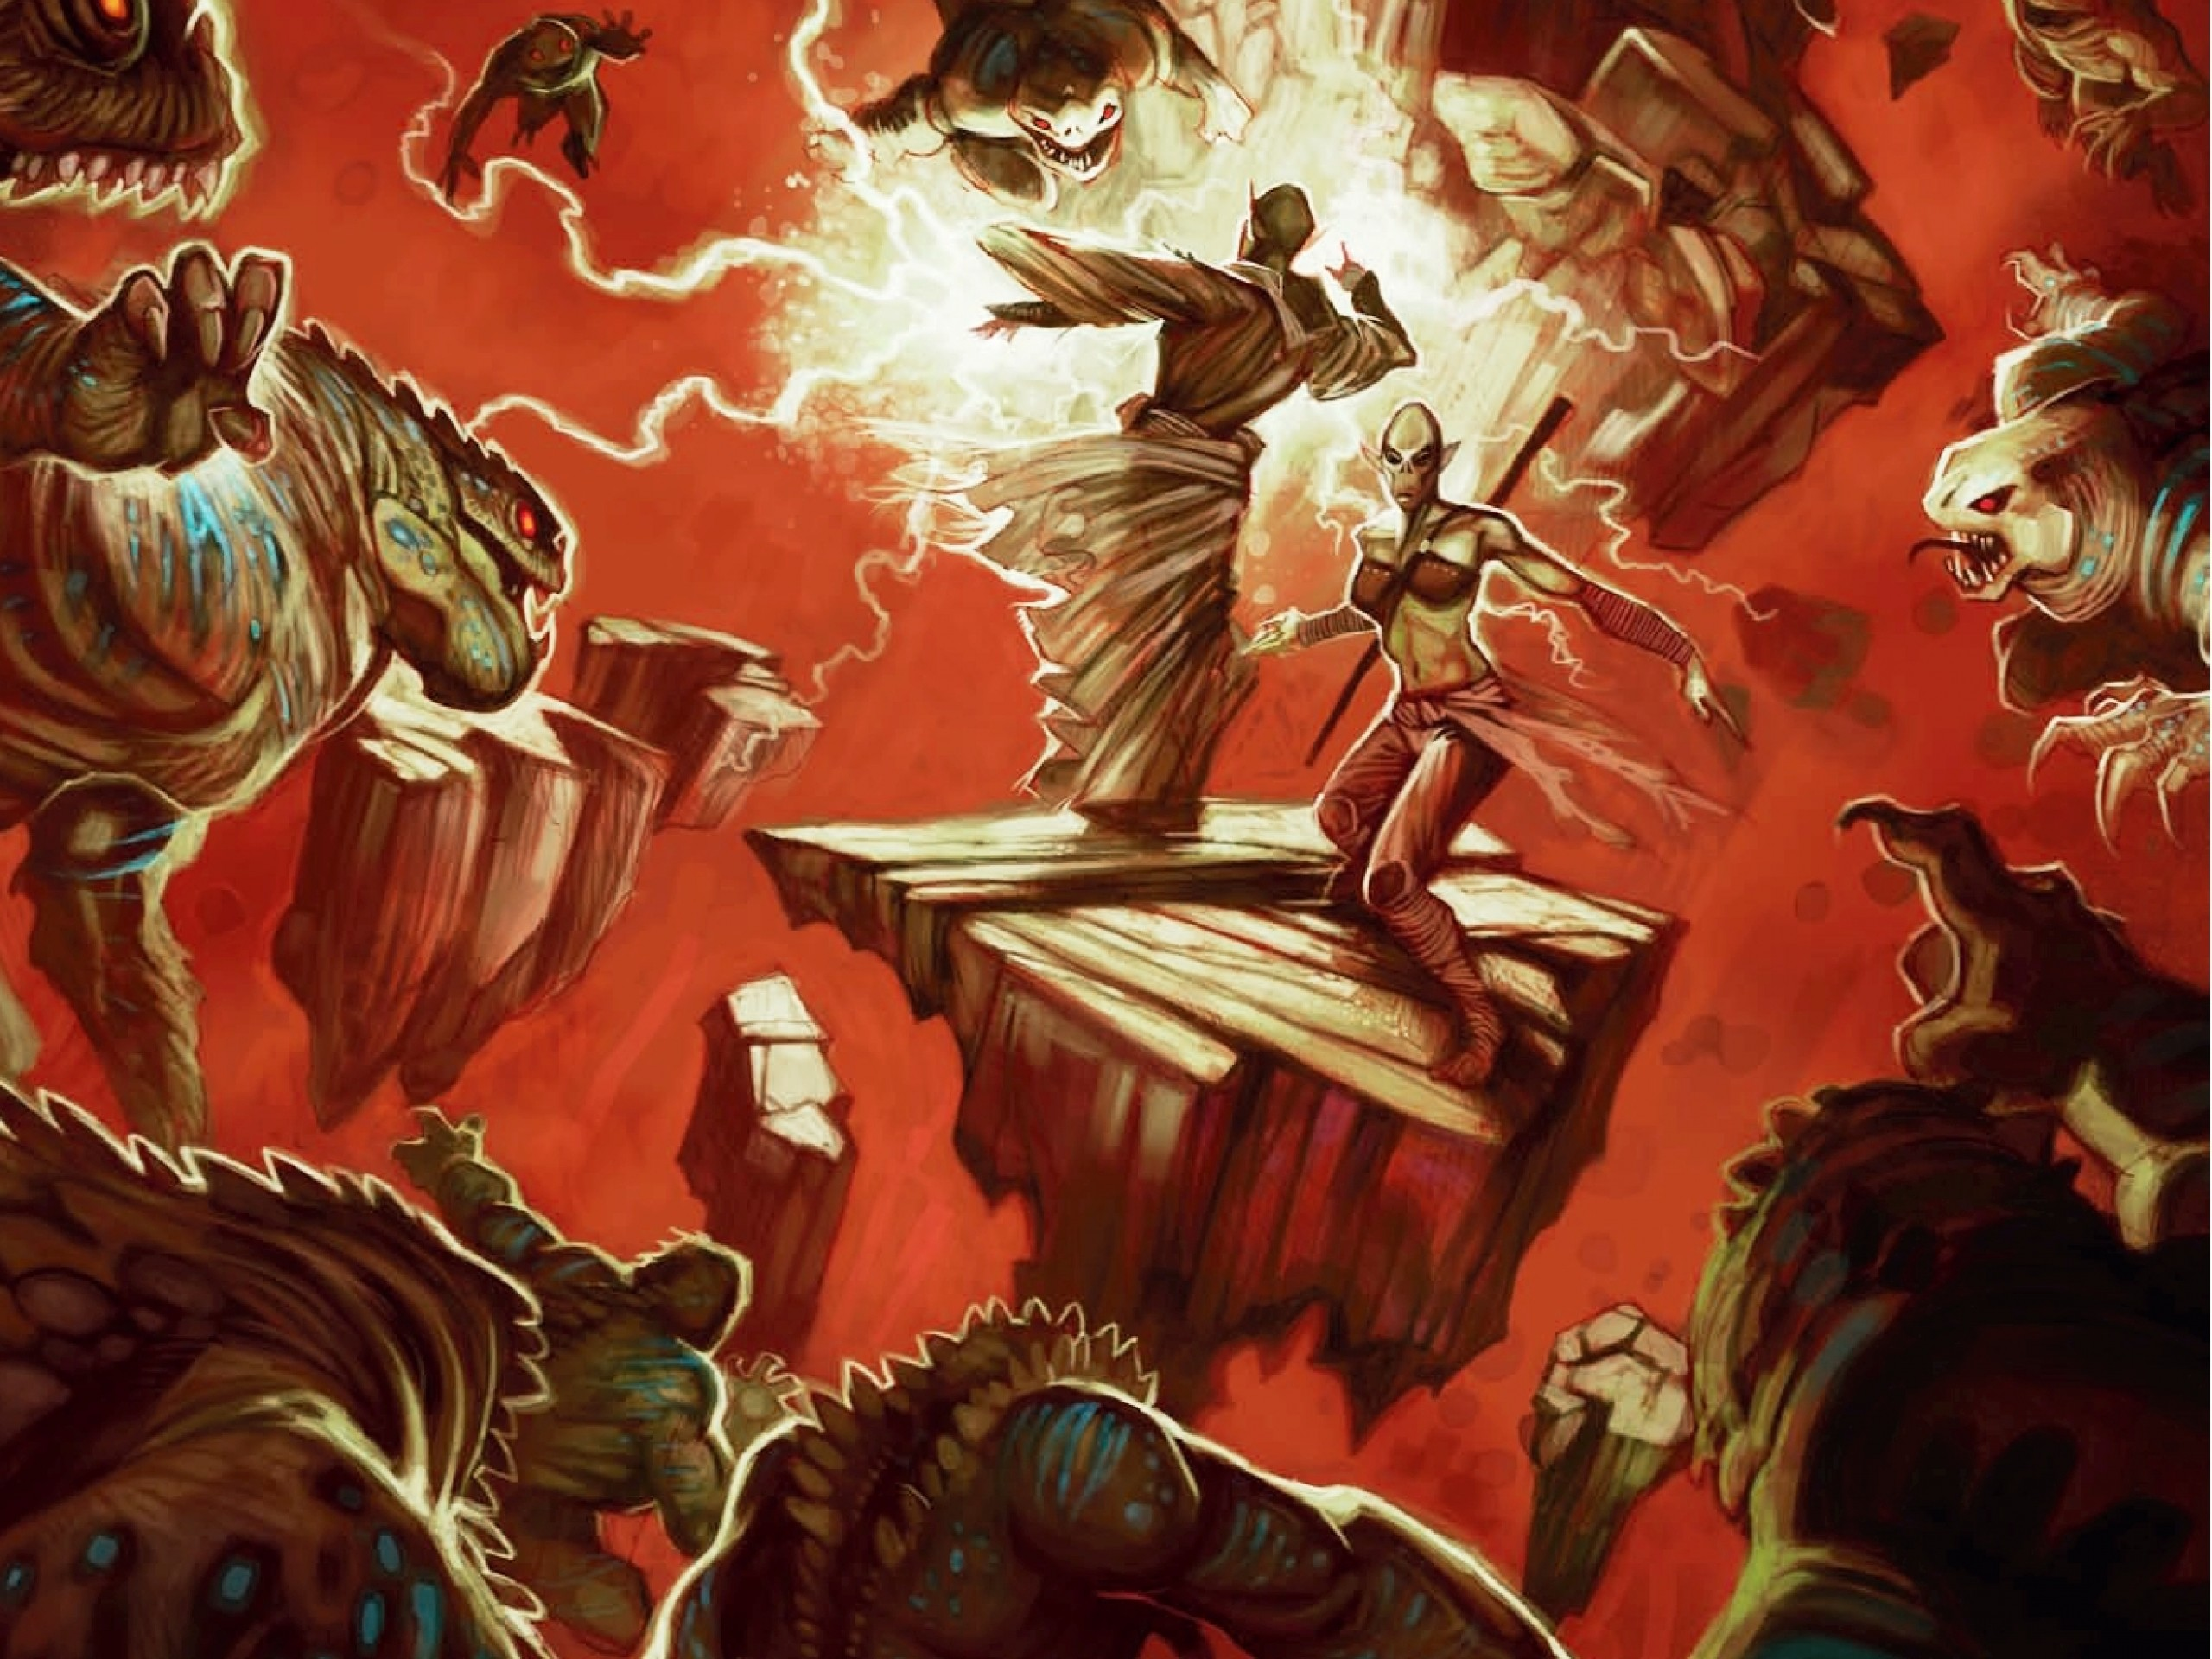 wizards dungeons and dragons monk 1315×986 wallpaper Art HD Wallpaper